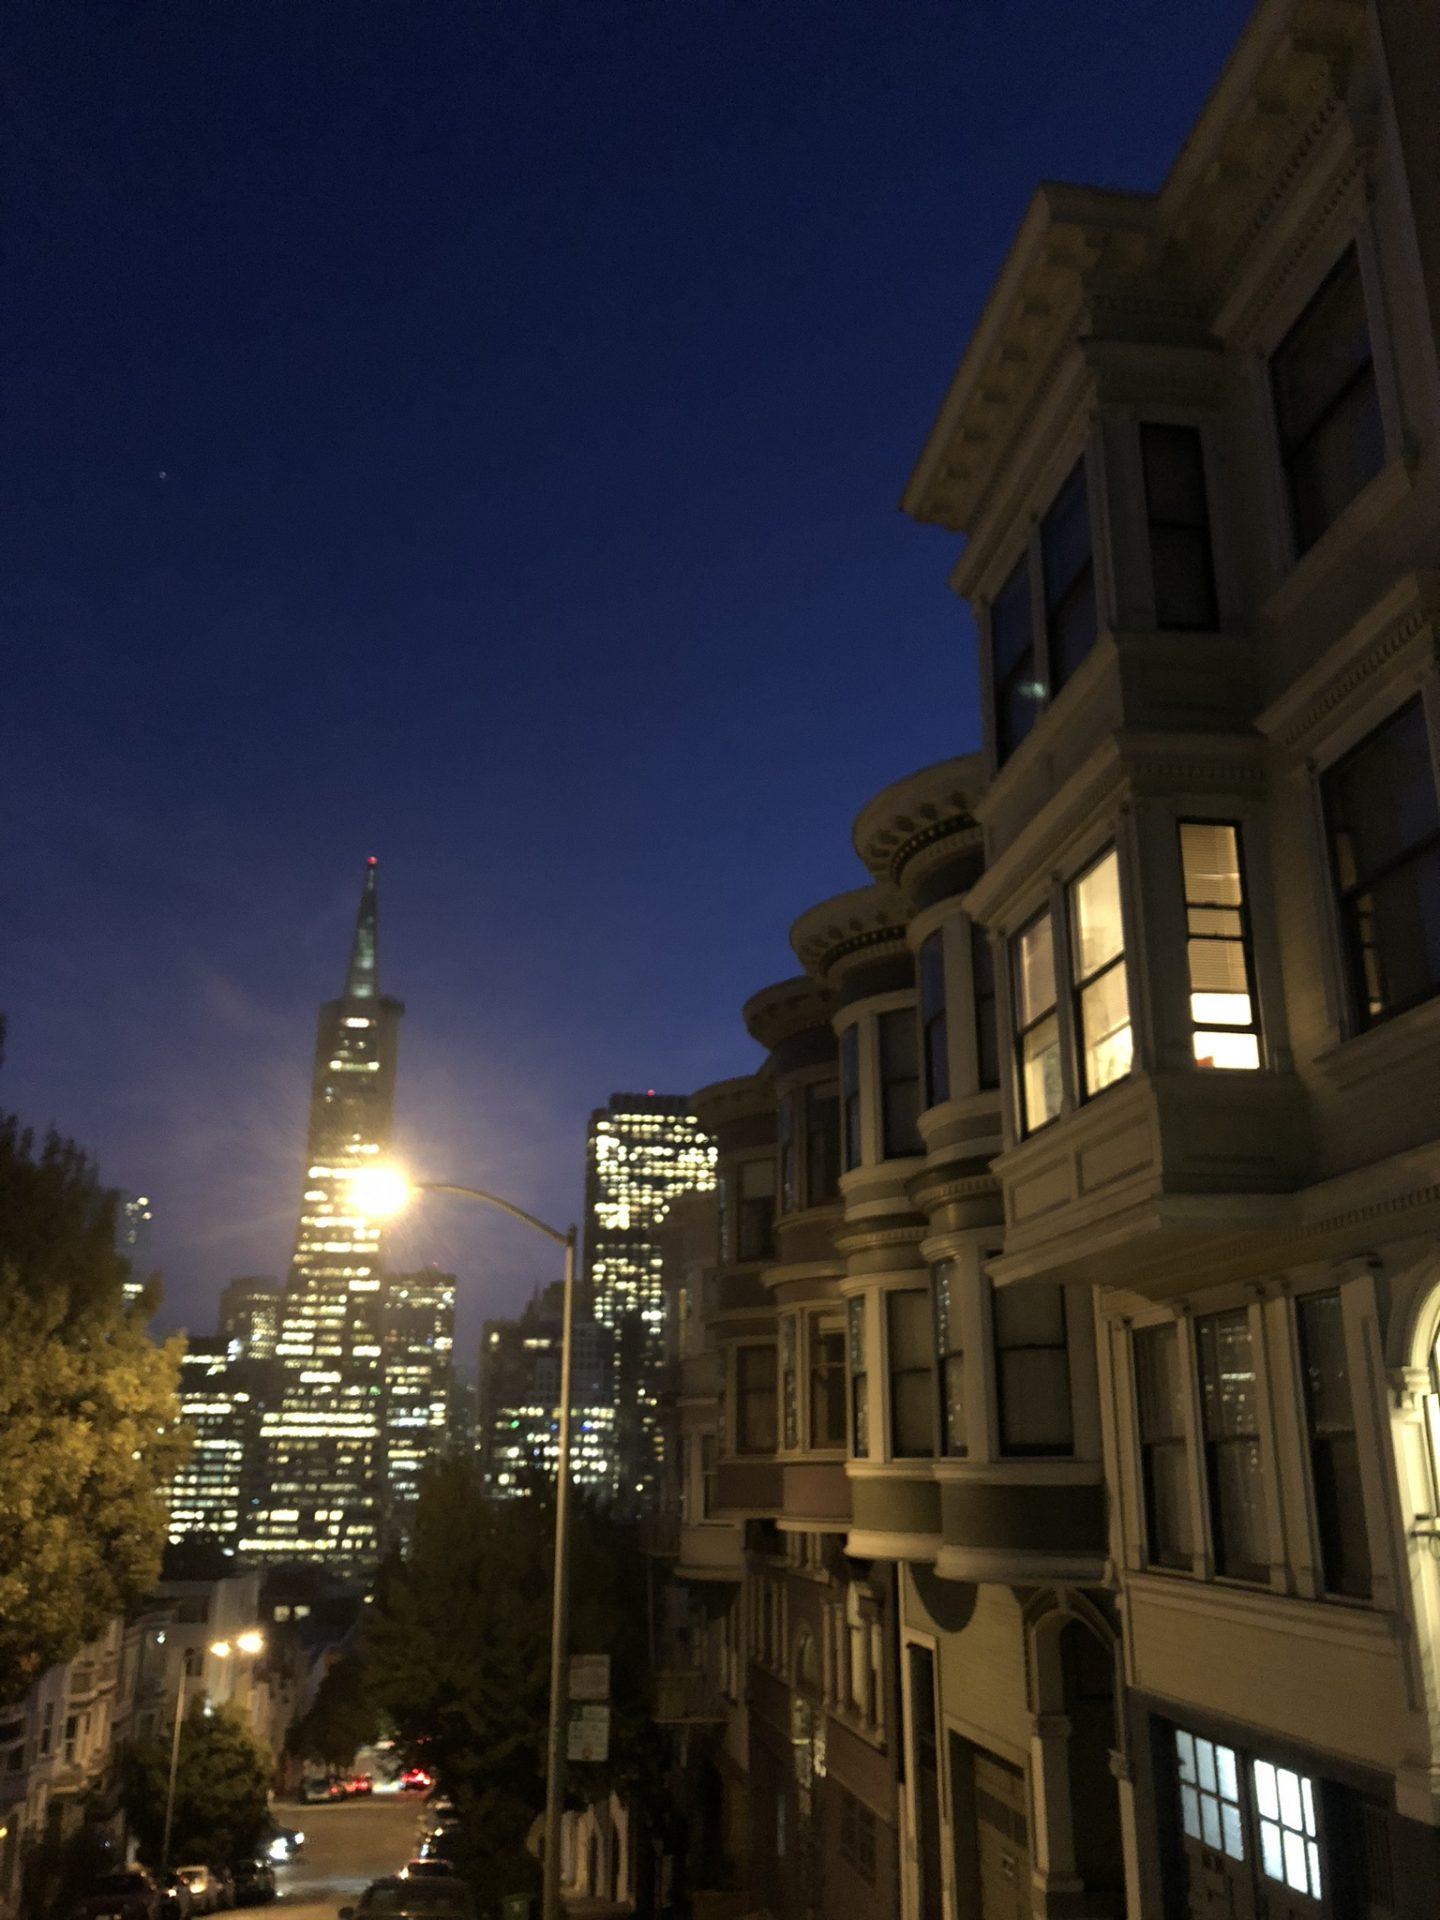 Night in San Francisco